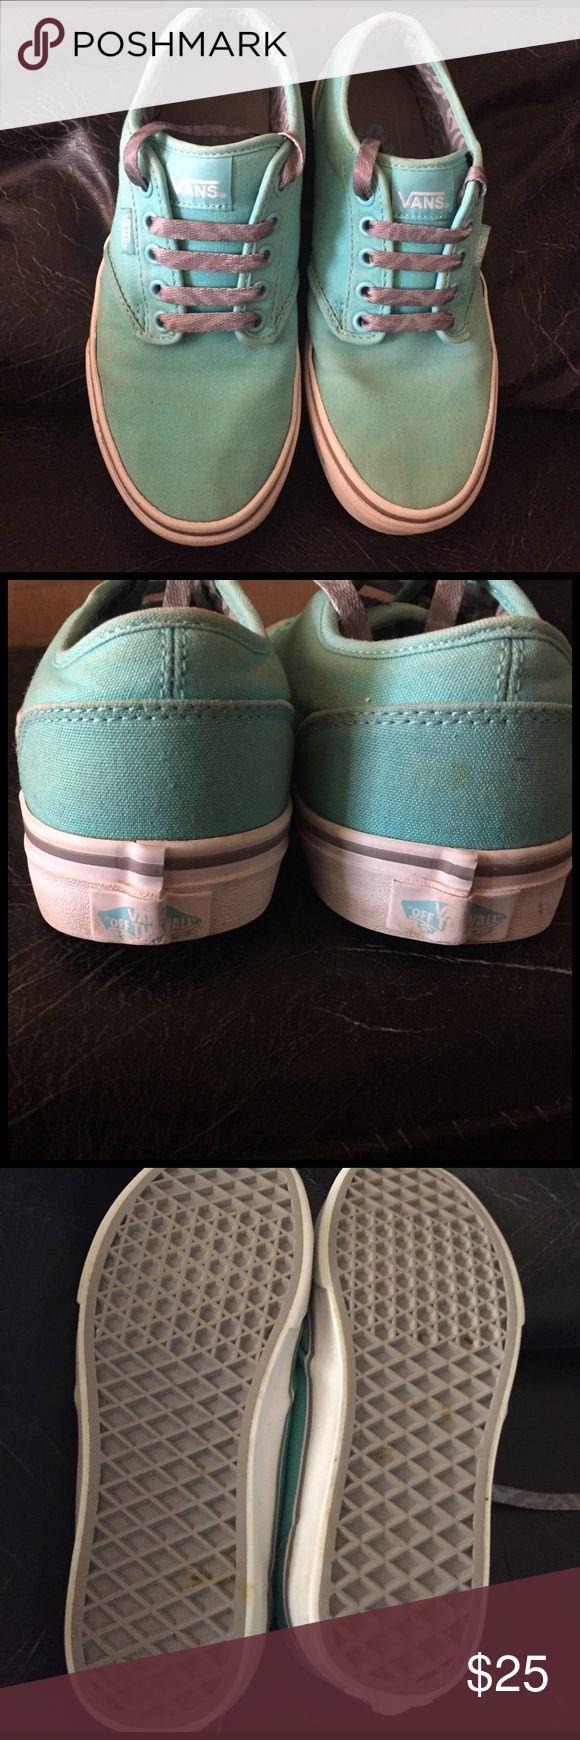 Tiffany blue vans w grey, animal print lining 🖤🖤 Tiffany blue Vans size 7. Grey animal print laces and lining. 🖤🖤🖤 Vans Shoes